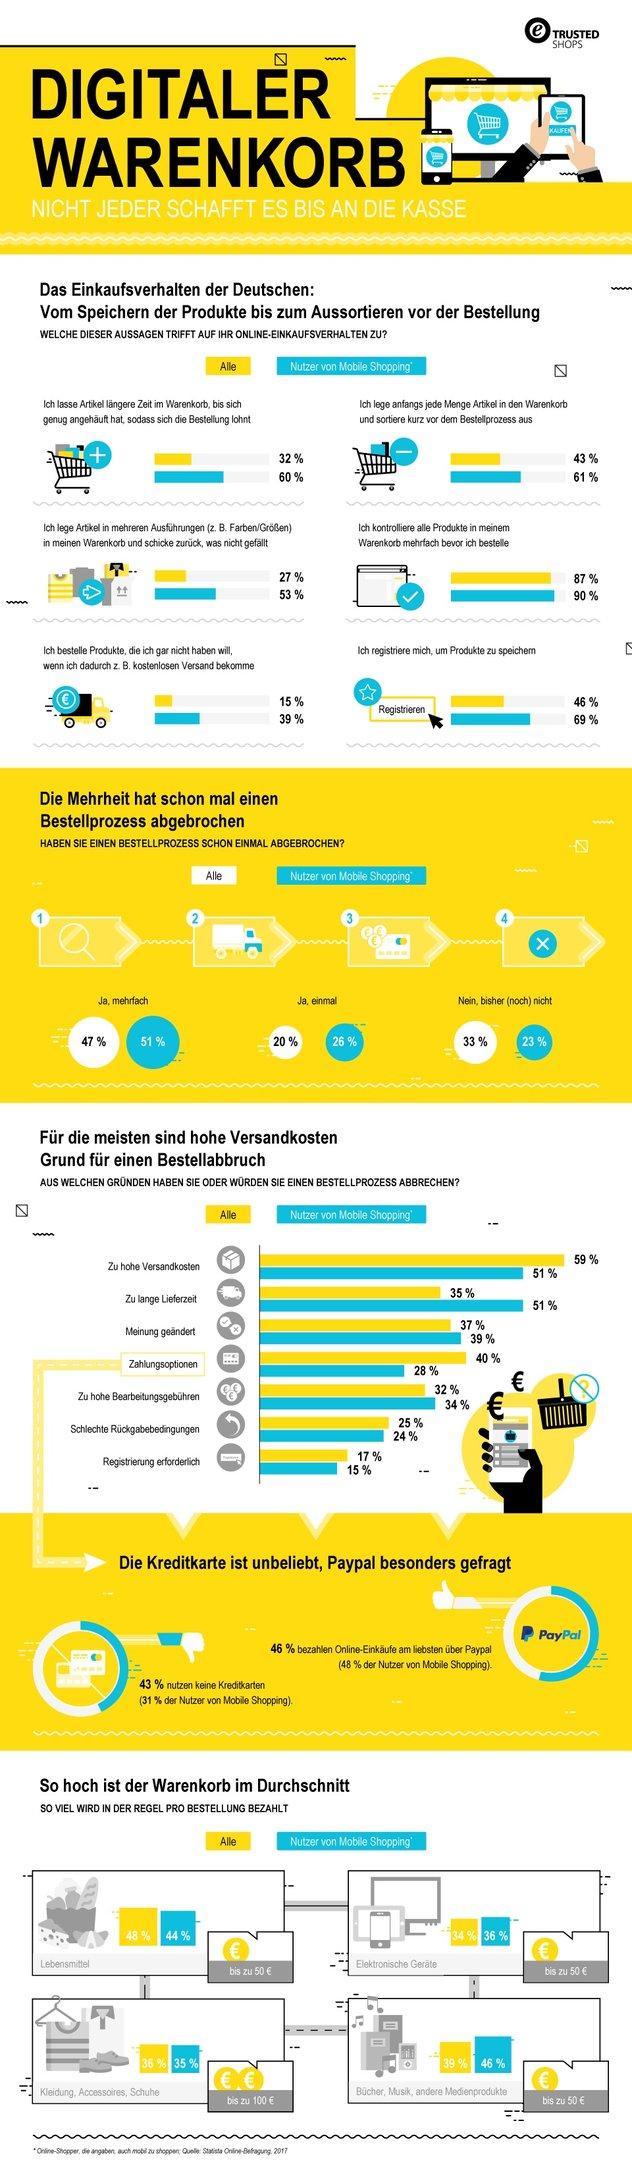 Infografik Warenkorb Checkout-Optimierungg